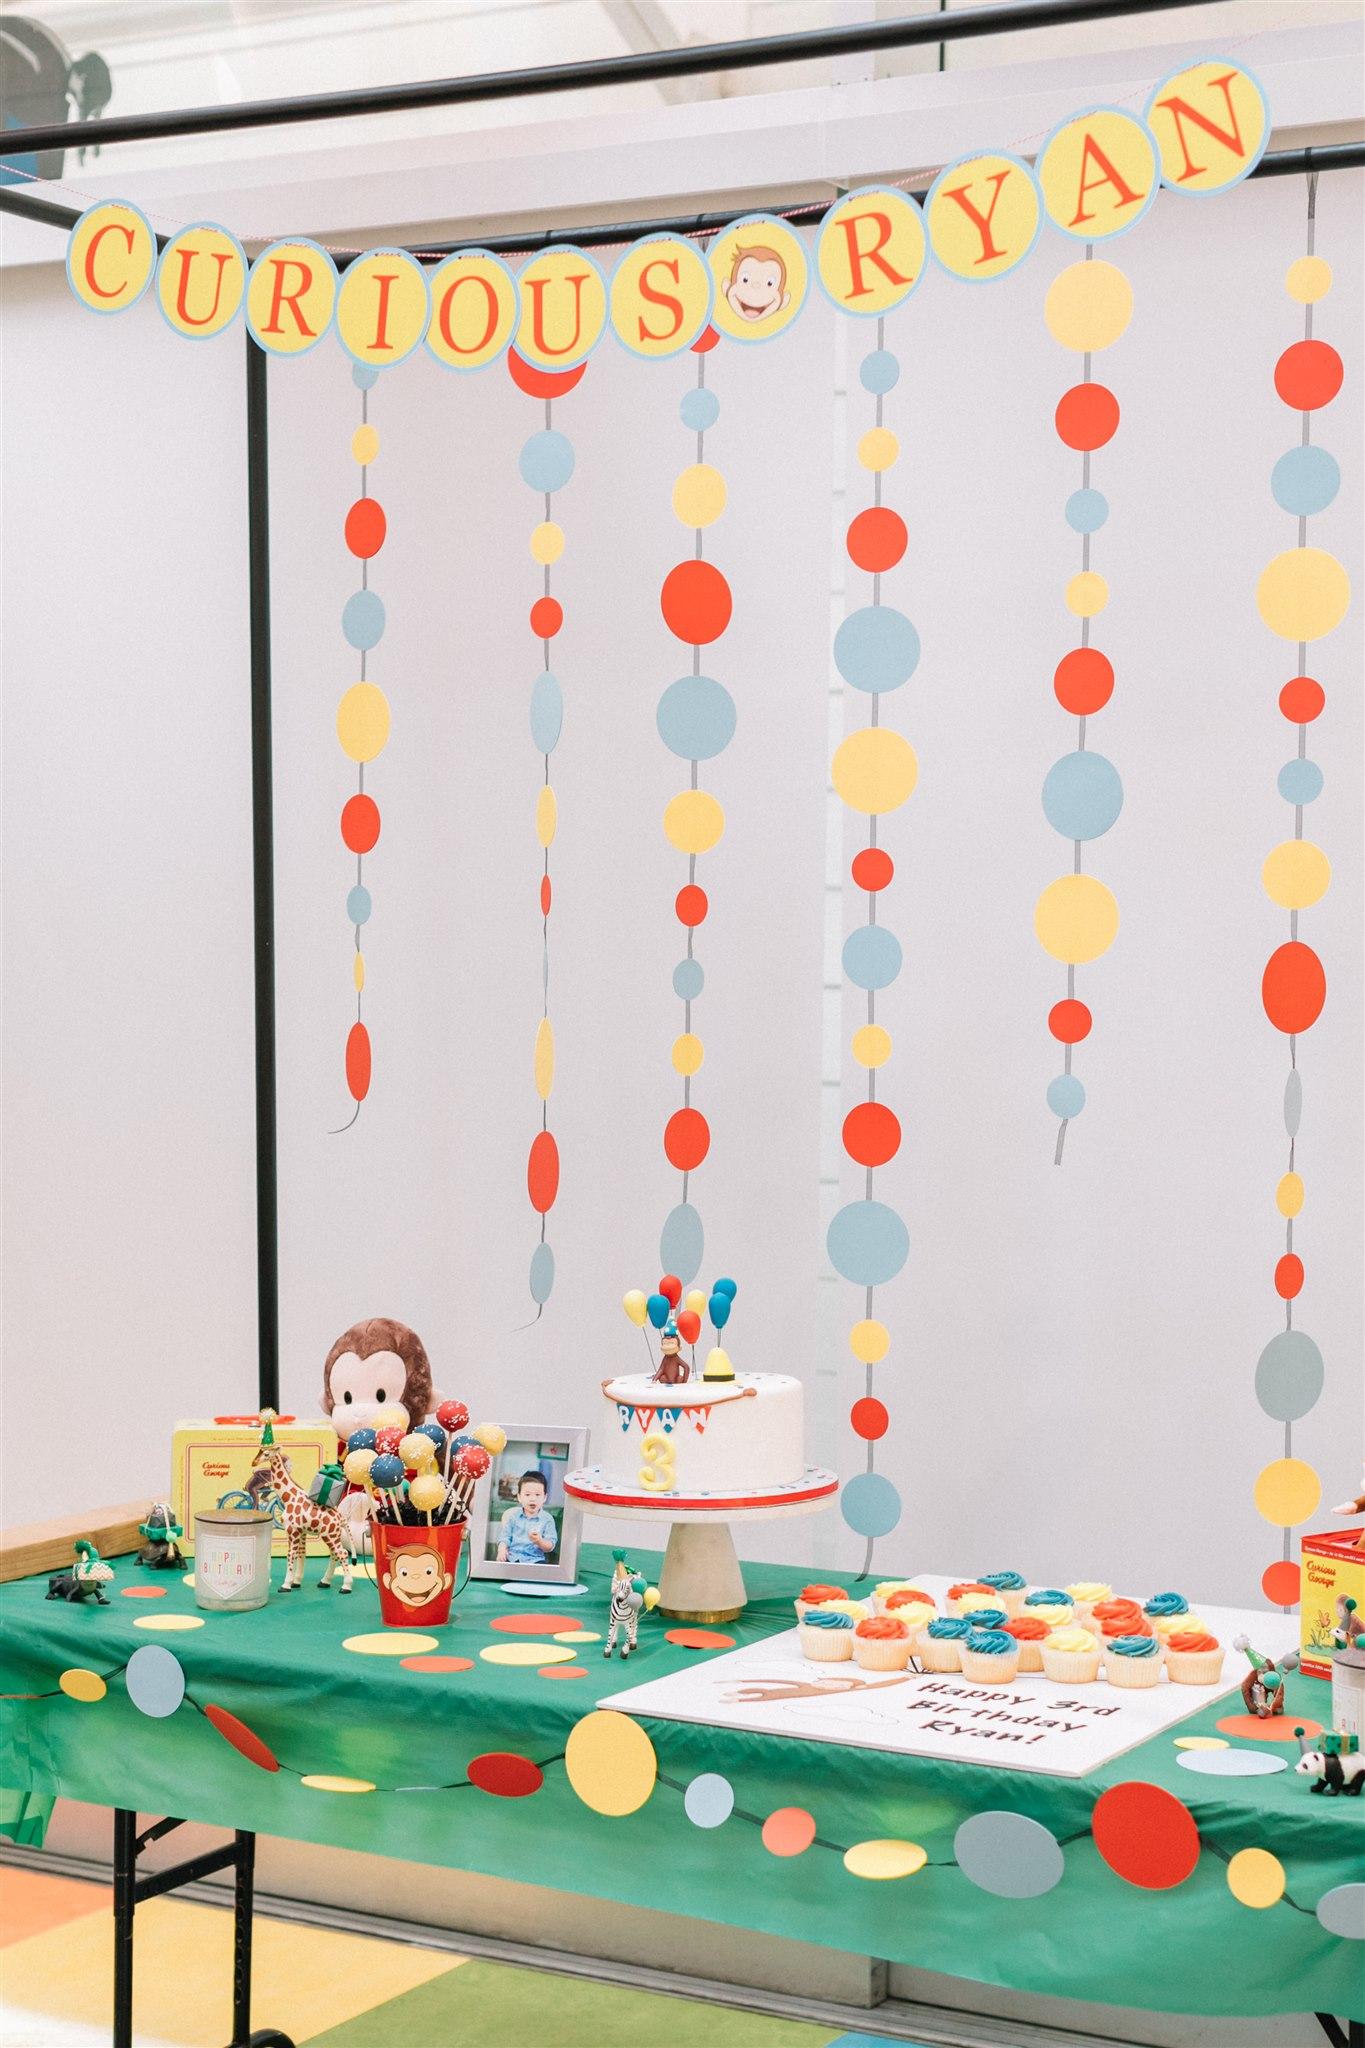 Ryan's 3rd Birthday - Kidspaceitlin-alohilani-photography-ryans-thir